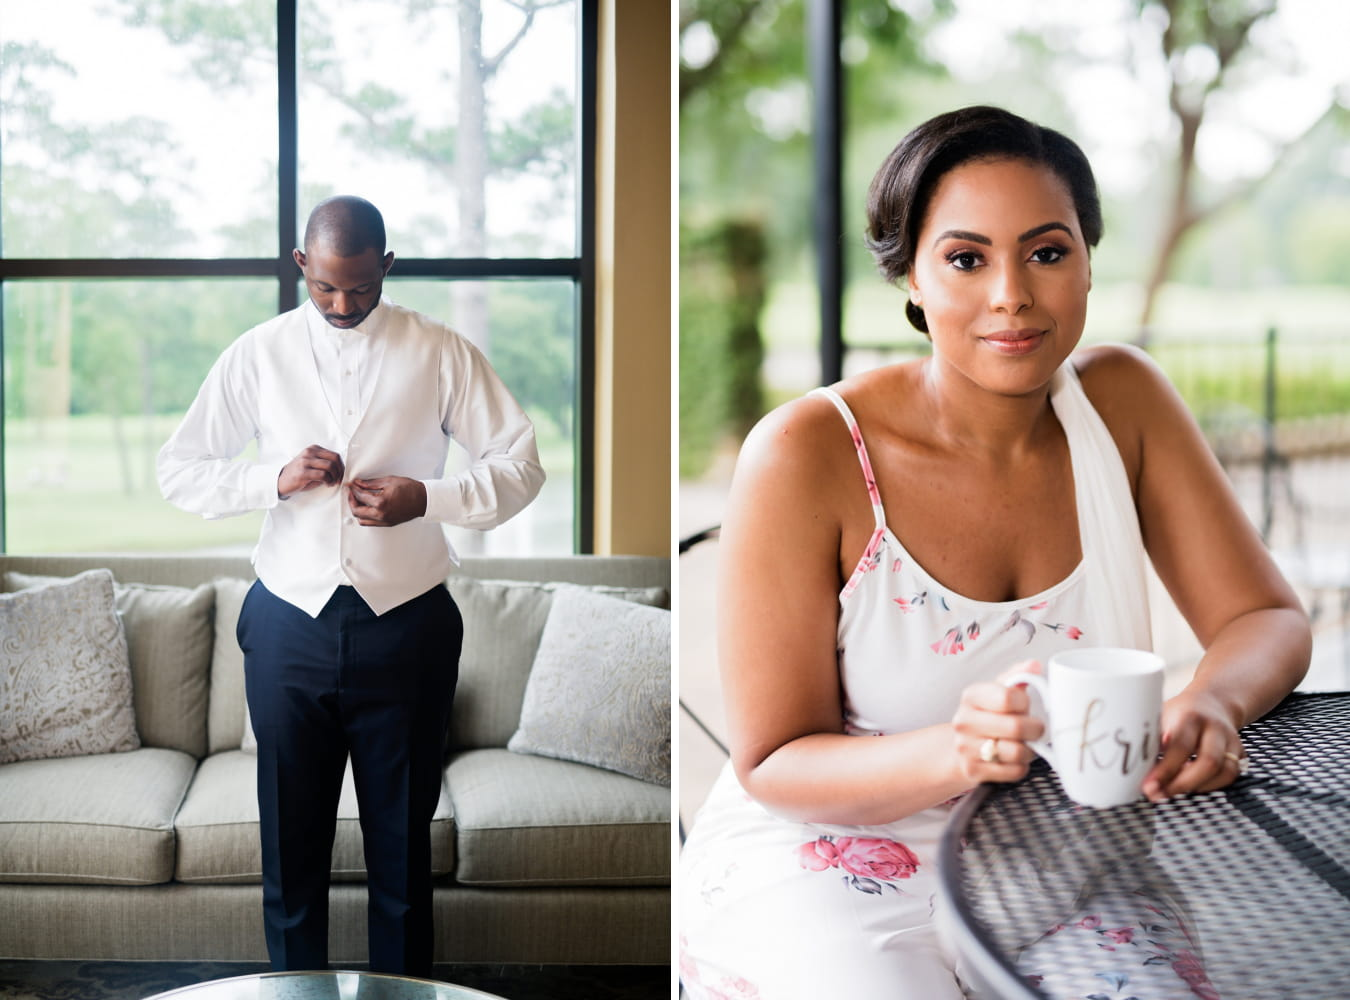 Houston Wedding- Pharris Photography- Getting Ready- Kristin + Robert -Bride- Groom